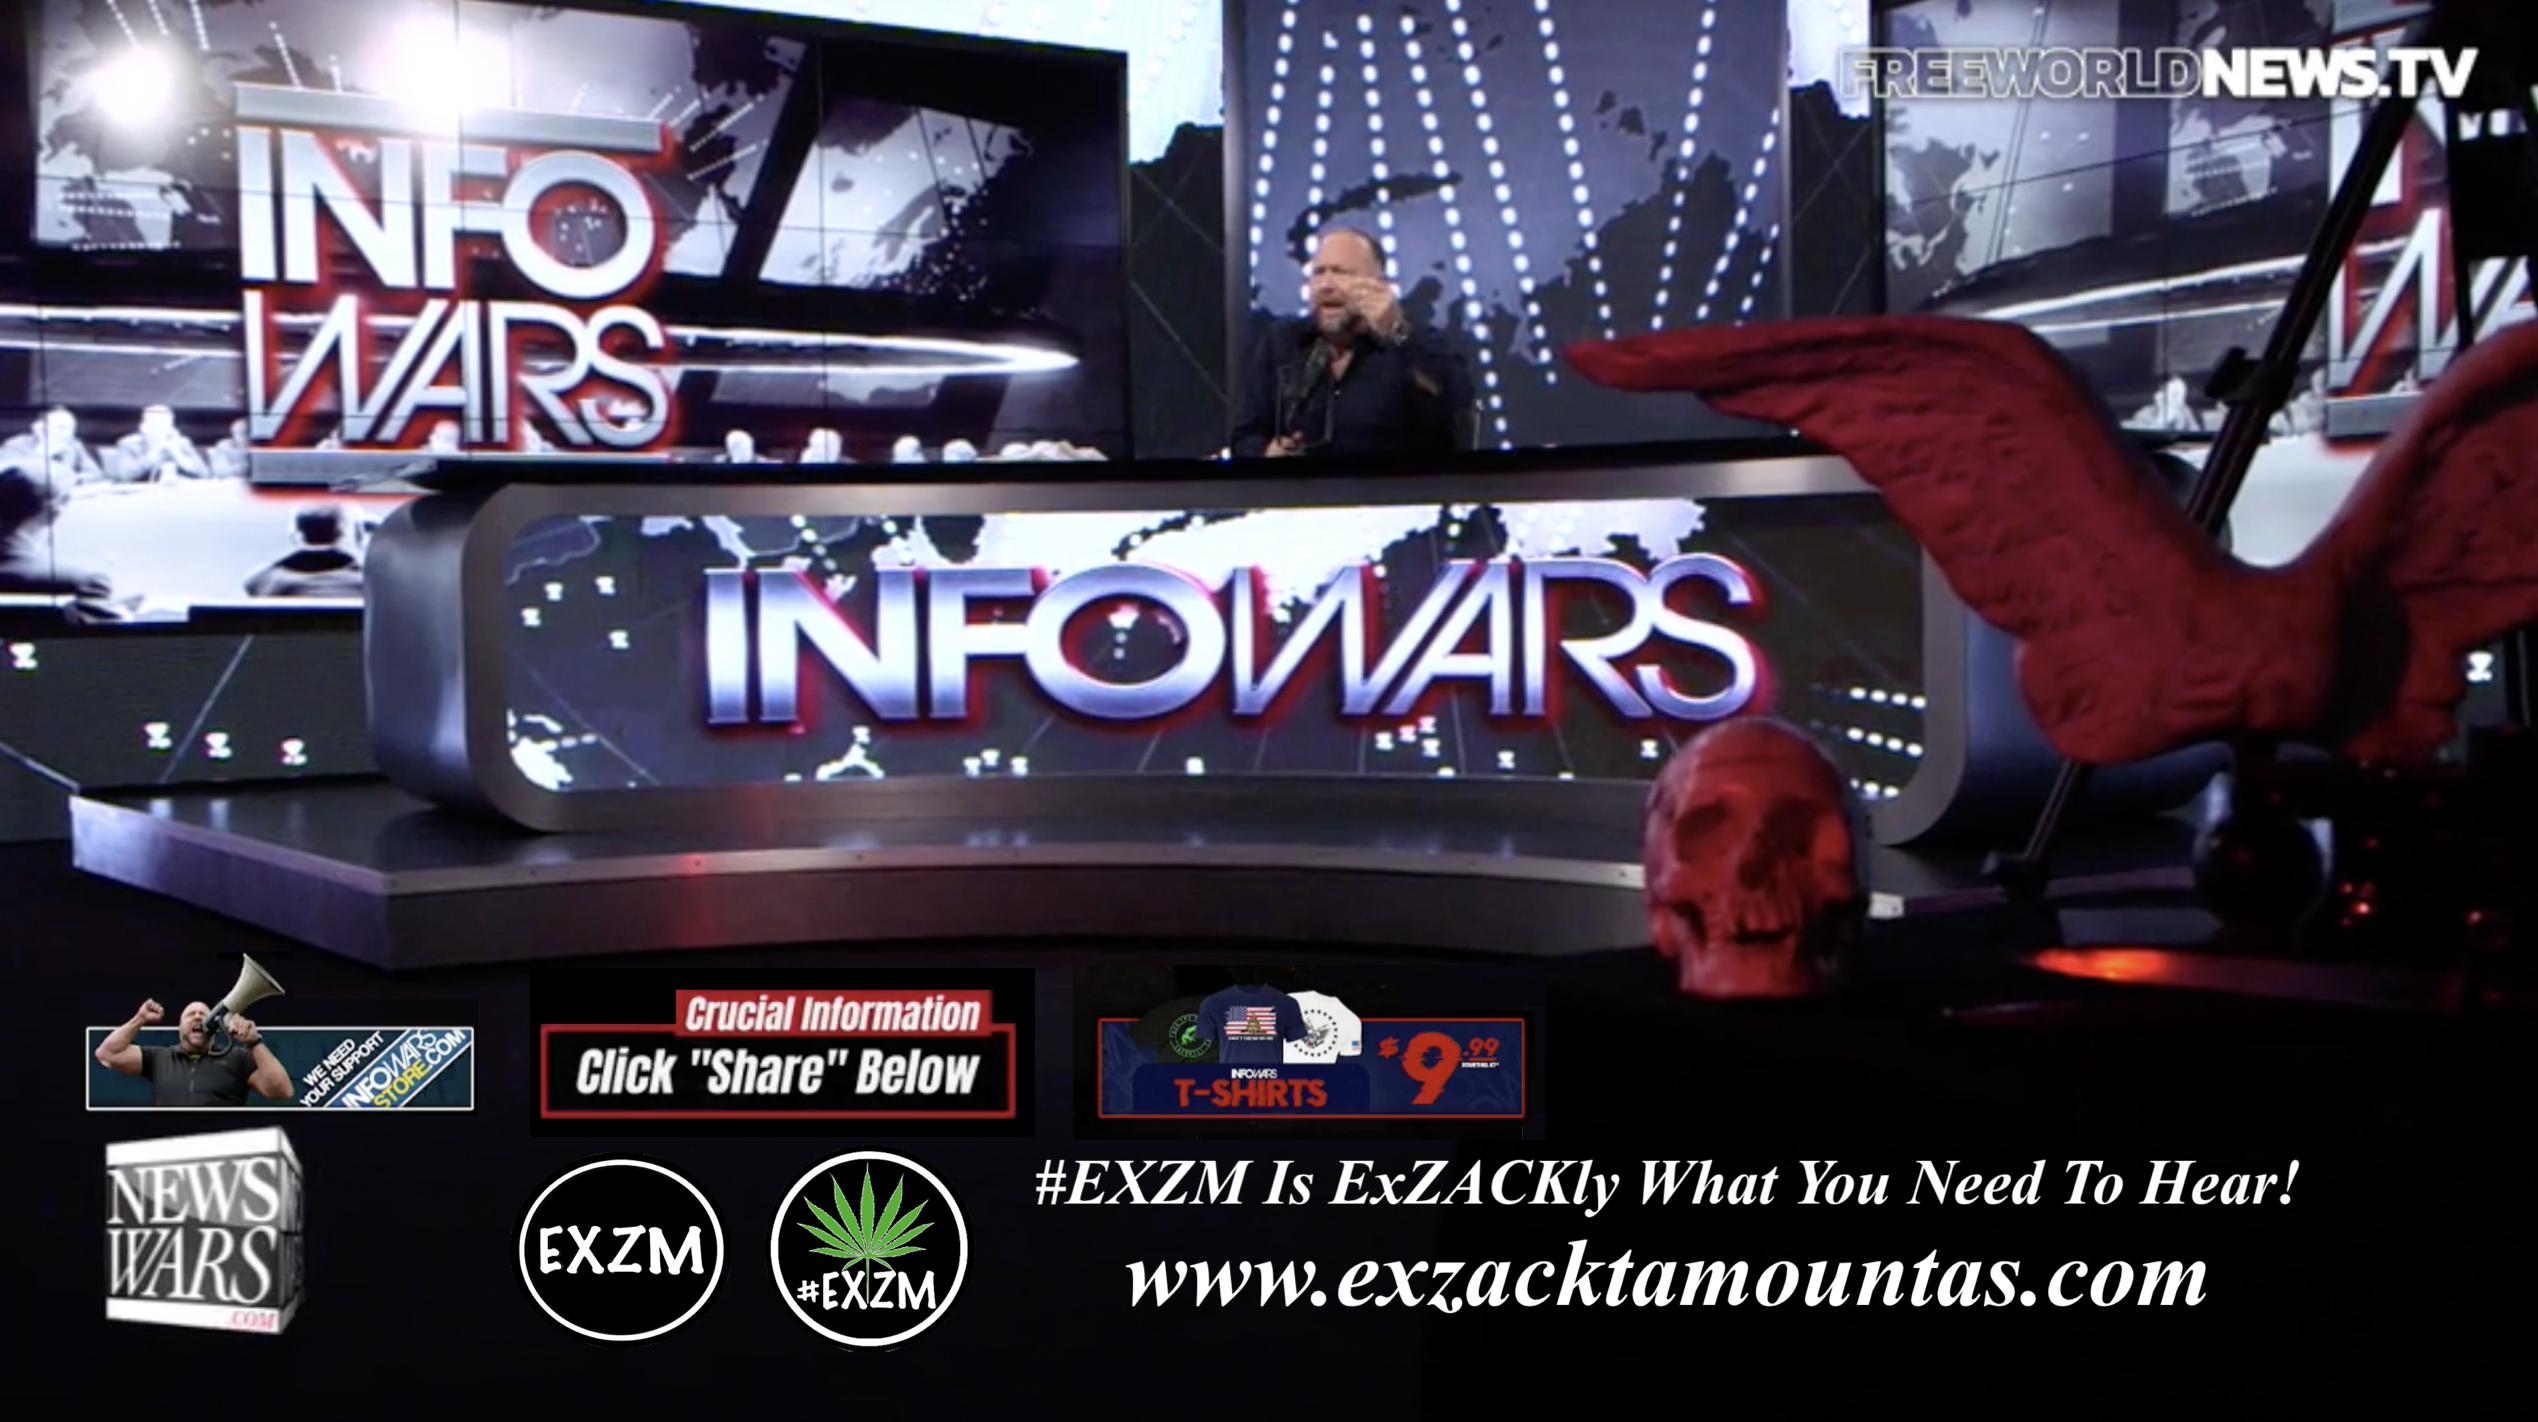 Alex Jones Live In Infowars Studio Free World News TV Human Skull Dagger Angel Wings EXZM Zack Mount September 23rd 2021 copy